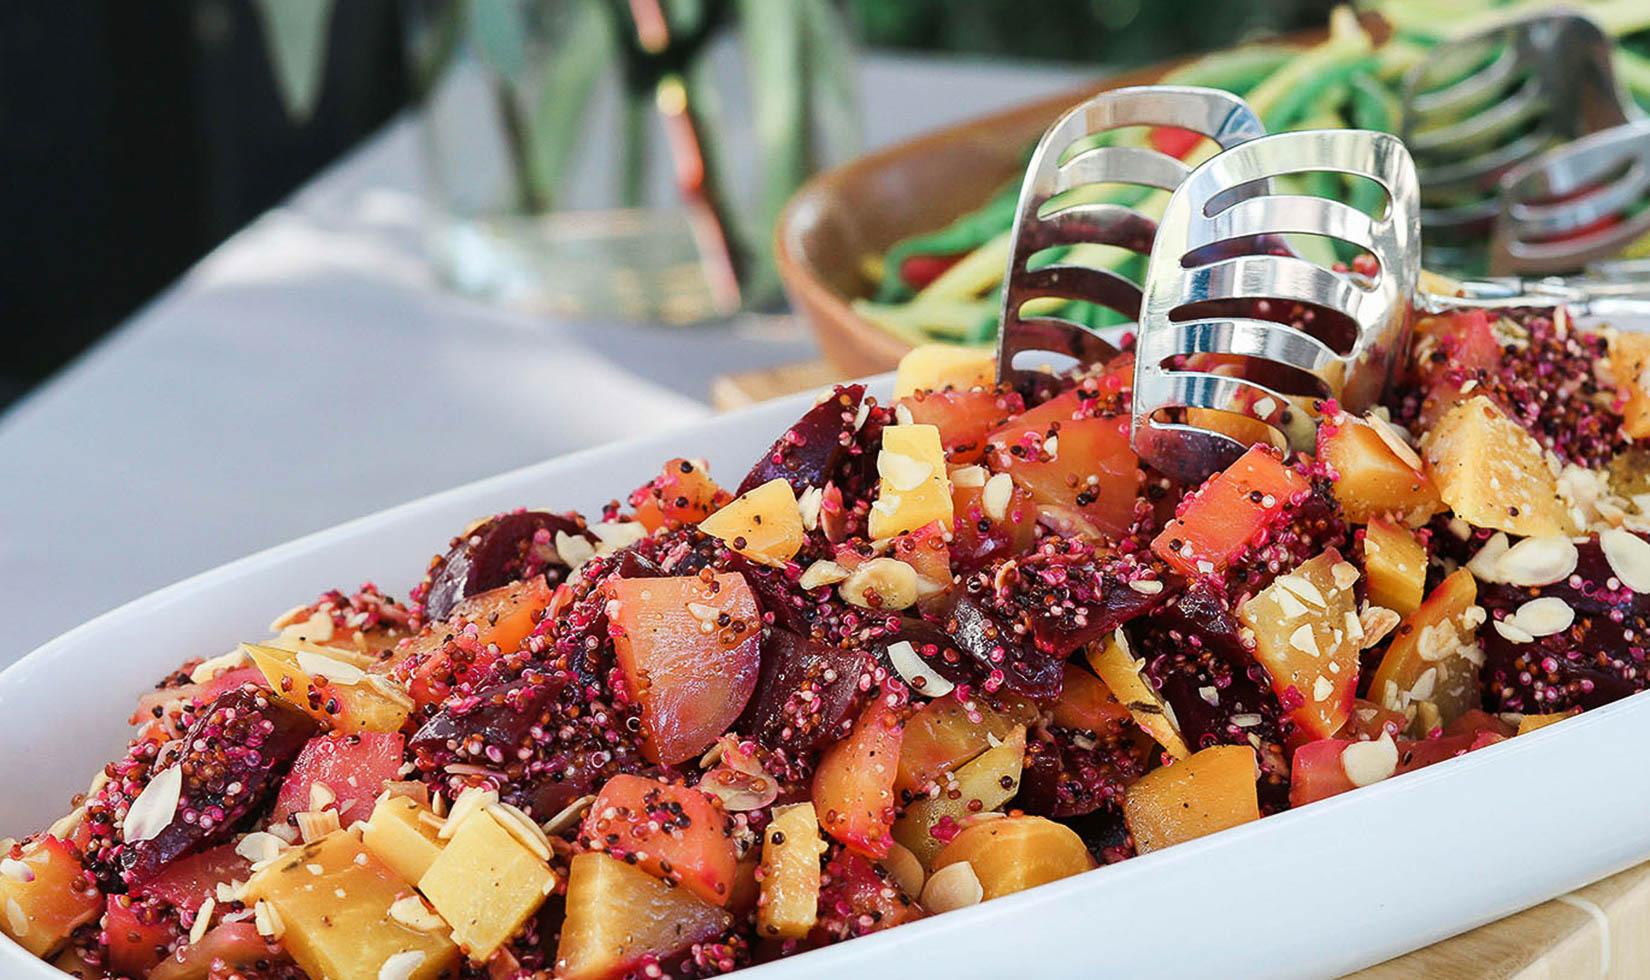 Serving dish full of beet salad